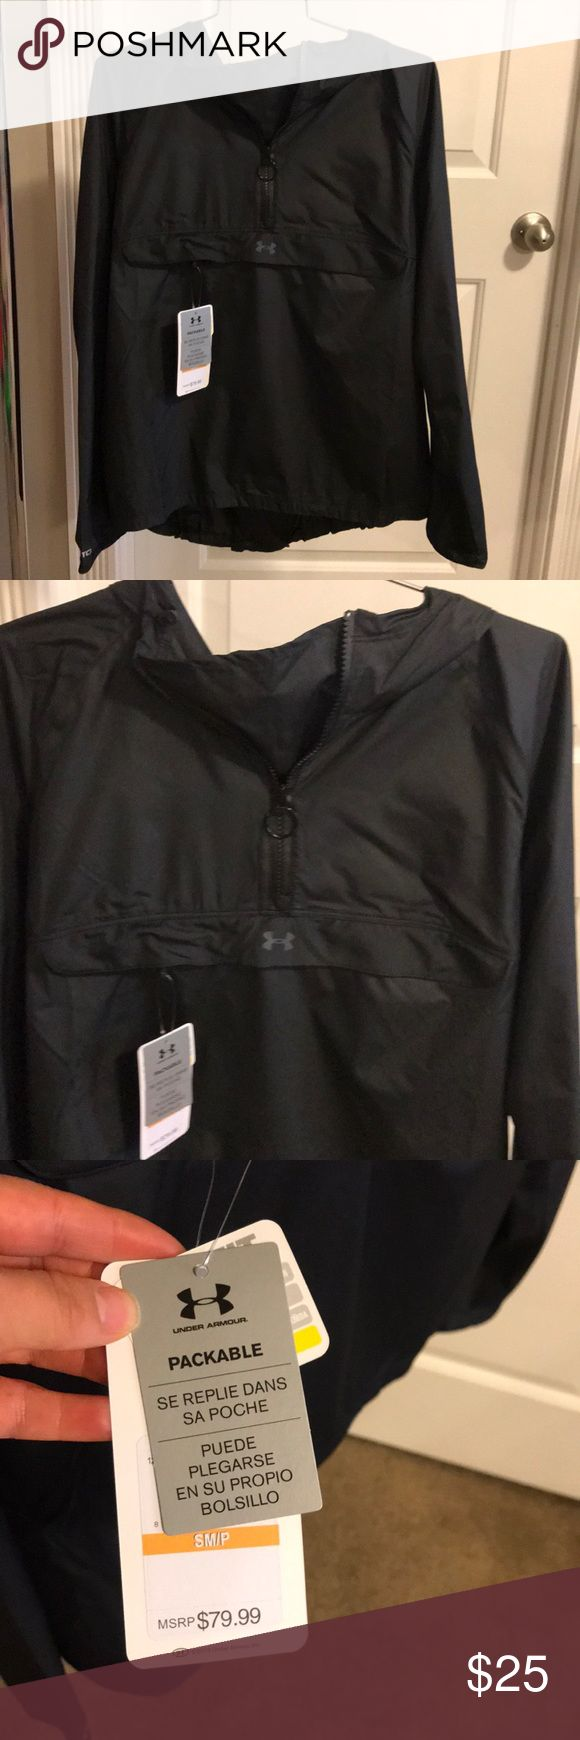 Women's Under Armour raincoat!! Women's Under Armour raincoat!!! Brand New!!!💕 Under Armour Jackets & Coats